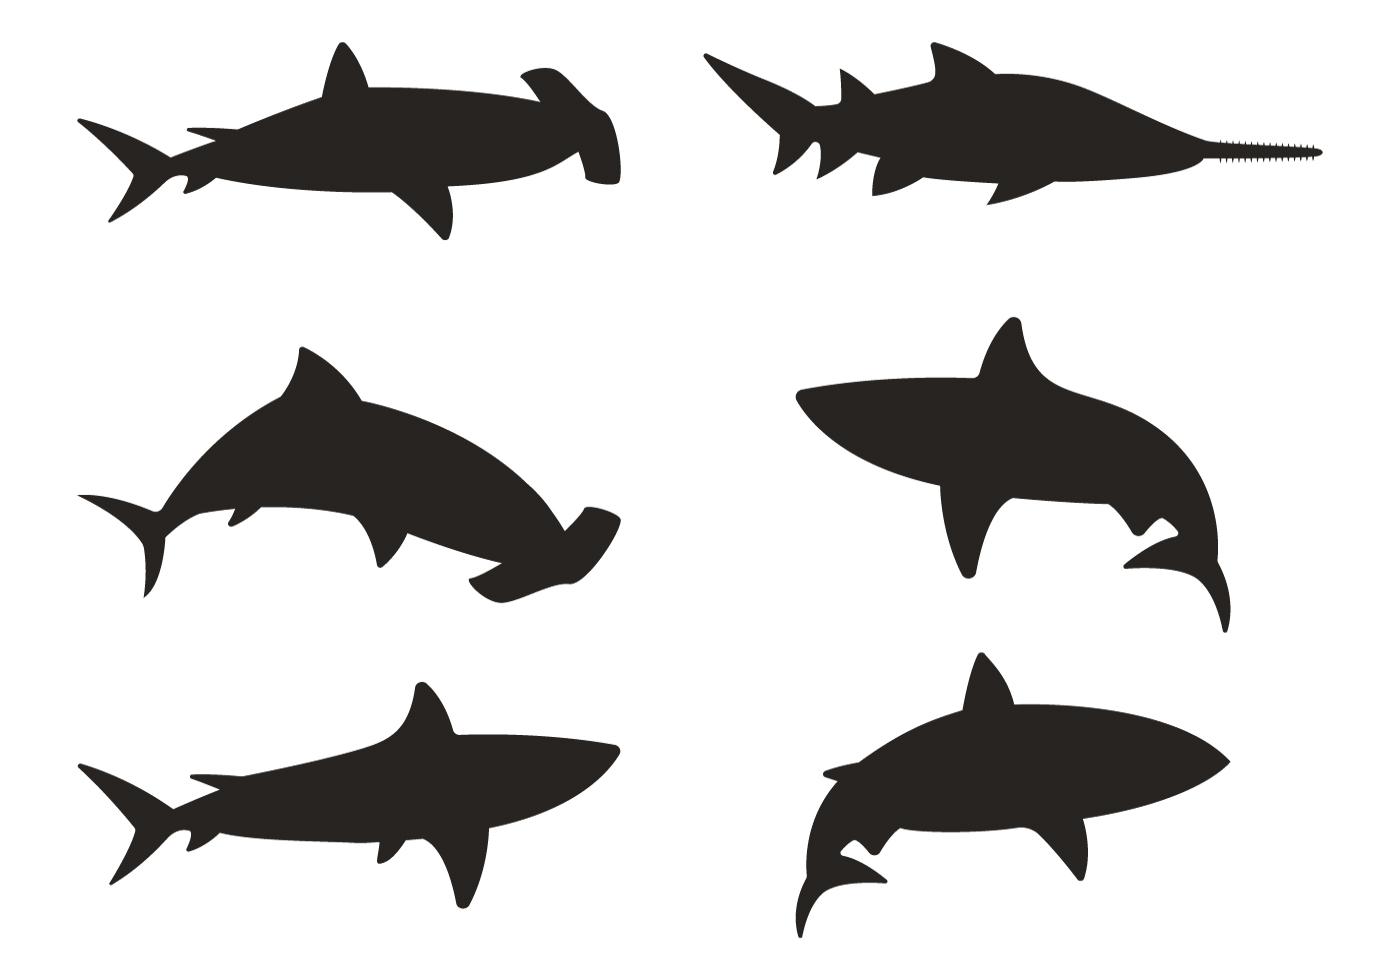 shark silhouette vectors download free vector art  stock Shark Fin Clip Art Border Shark Fin Clip Art Happy